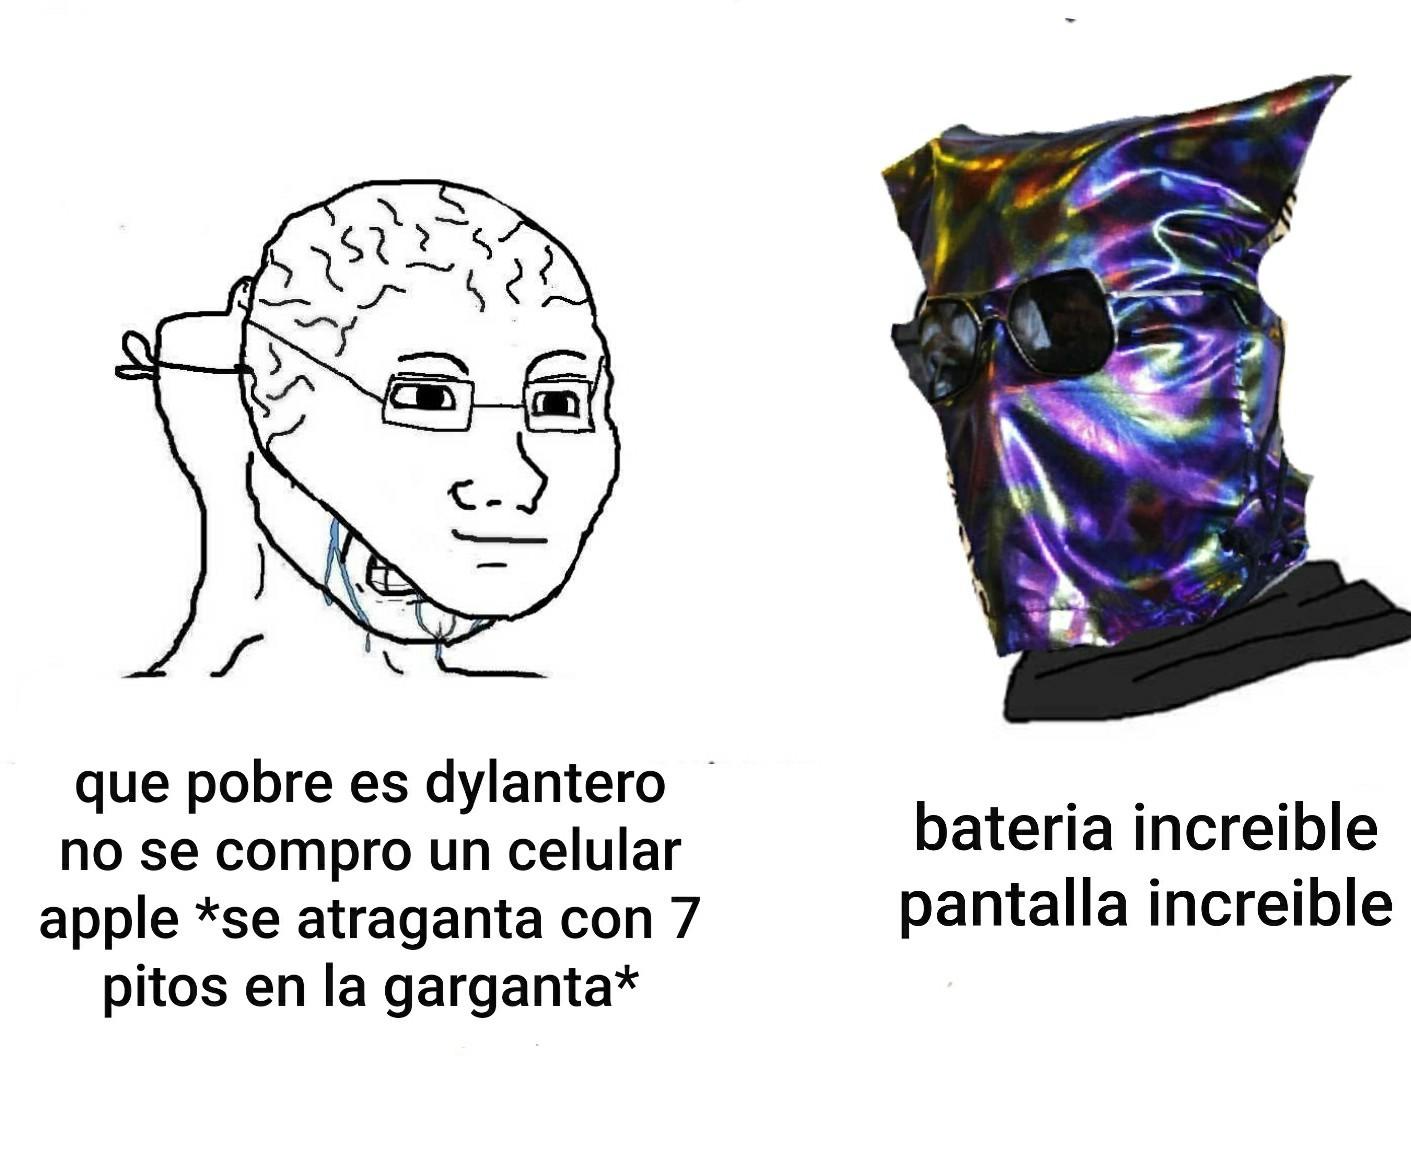 Pantalla increible - meme